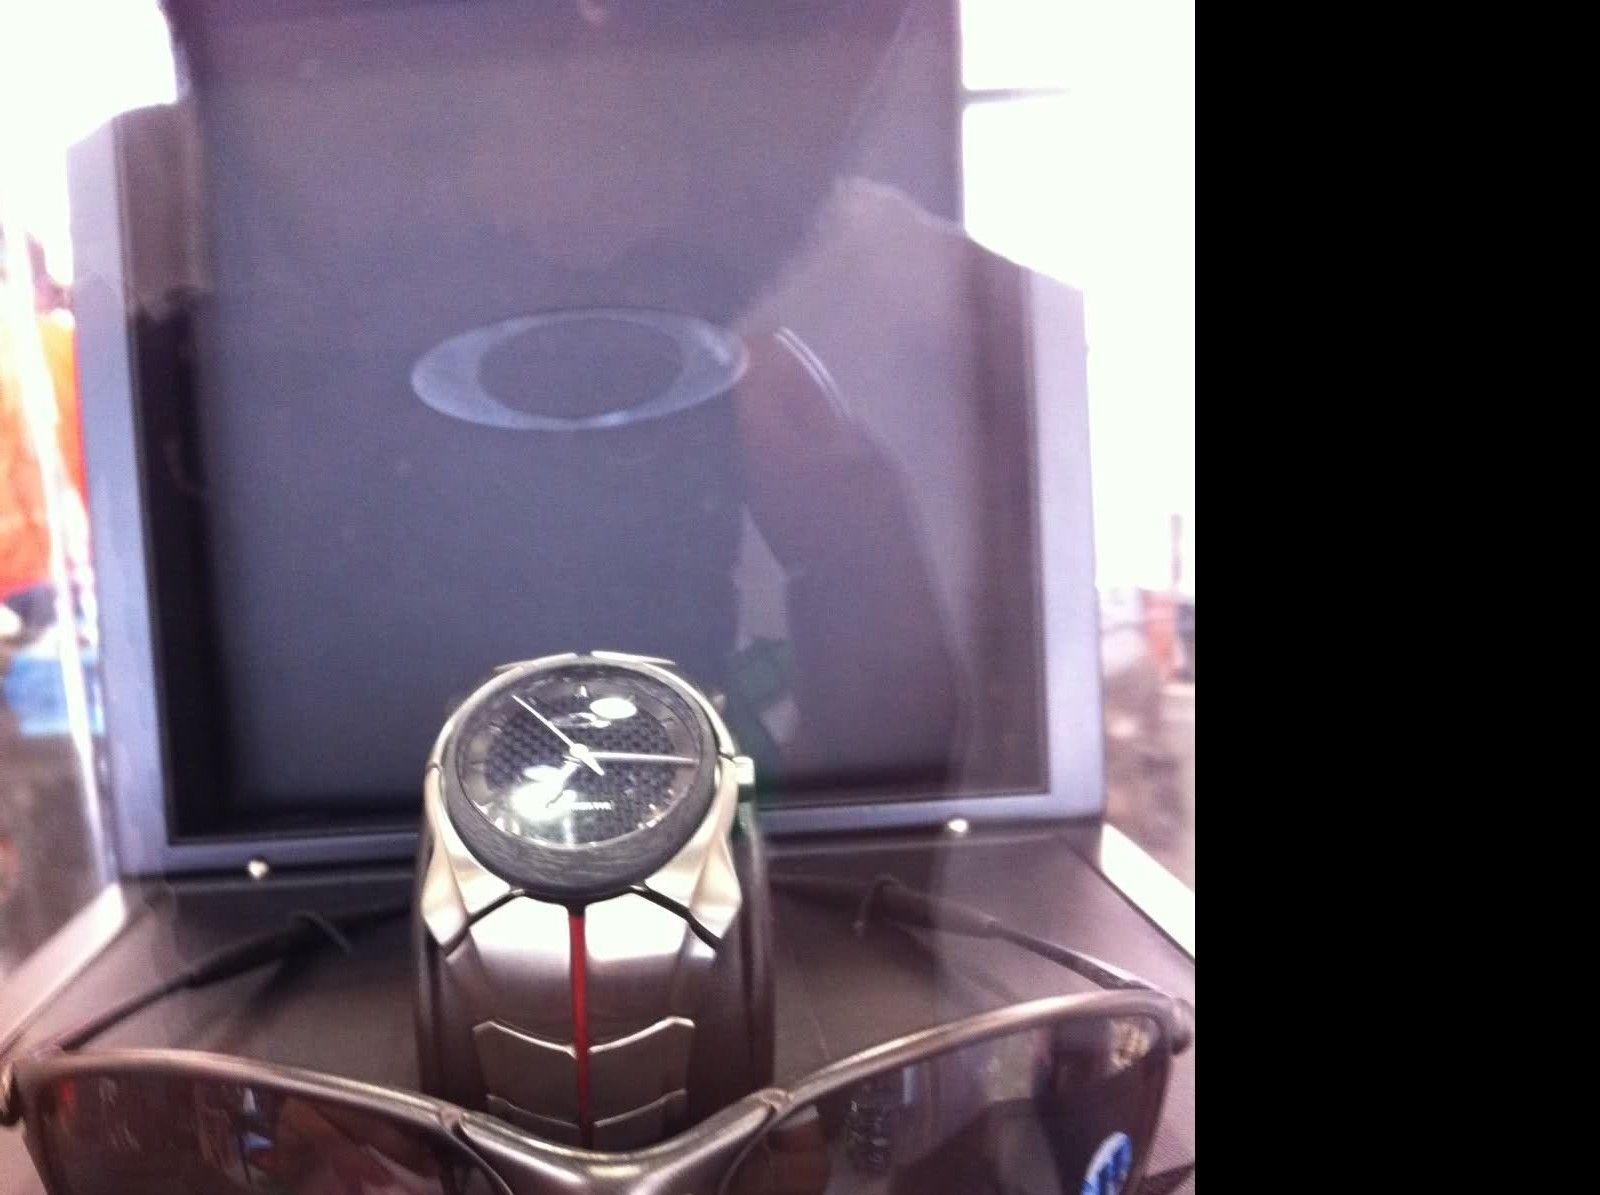 First Ever Oakley Watch/eyewear Bundle!! Only 50 Made! - 1zdx25h.jpg